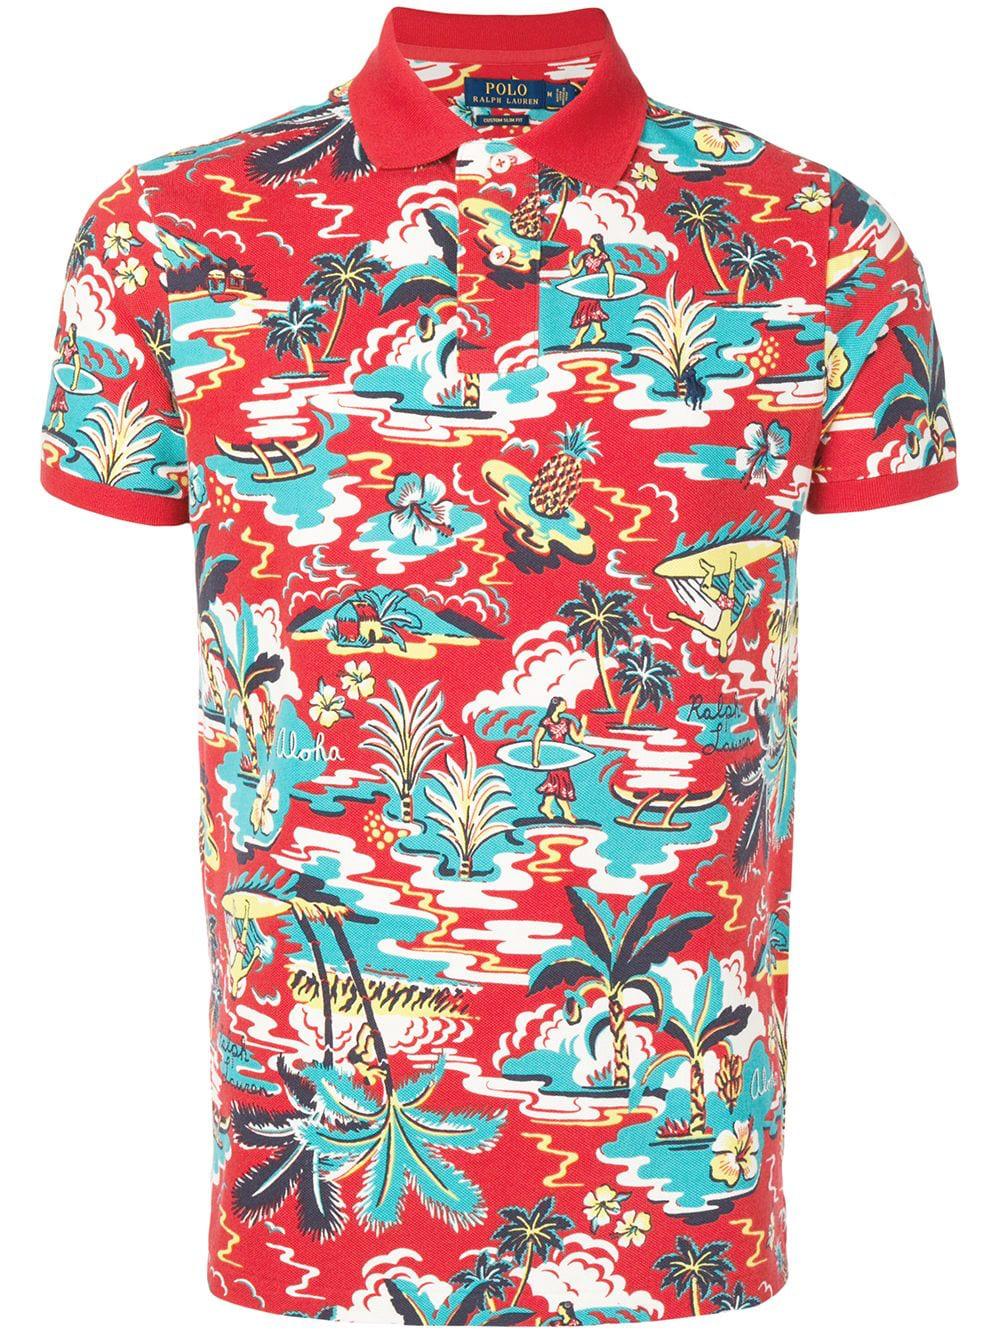 8da2005dd92eb6 Polo Ralph Lauren Poloshirt Mit Hawaii-Print - Rot In Red